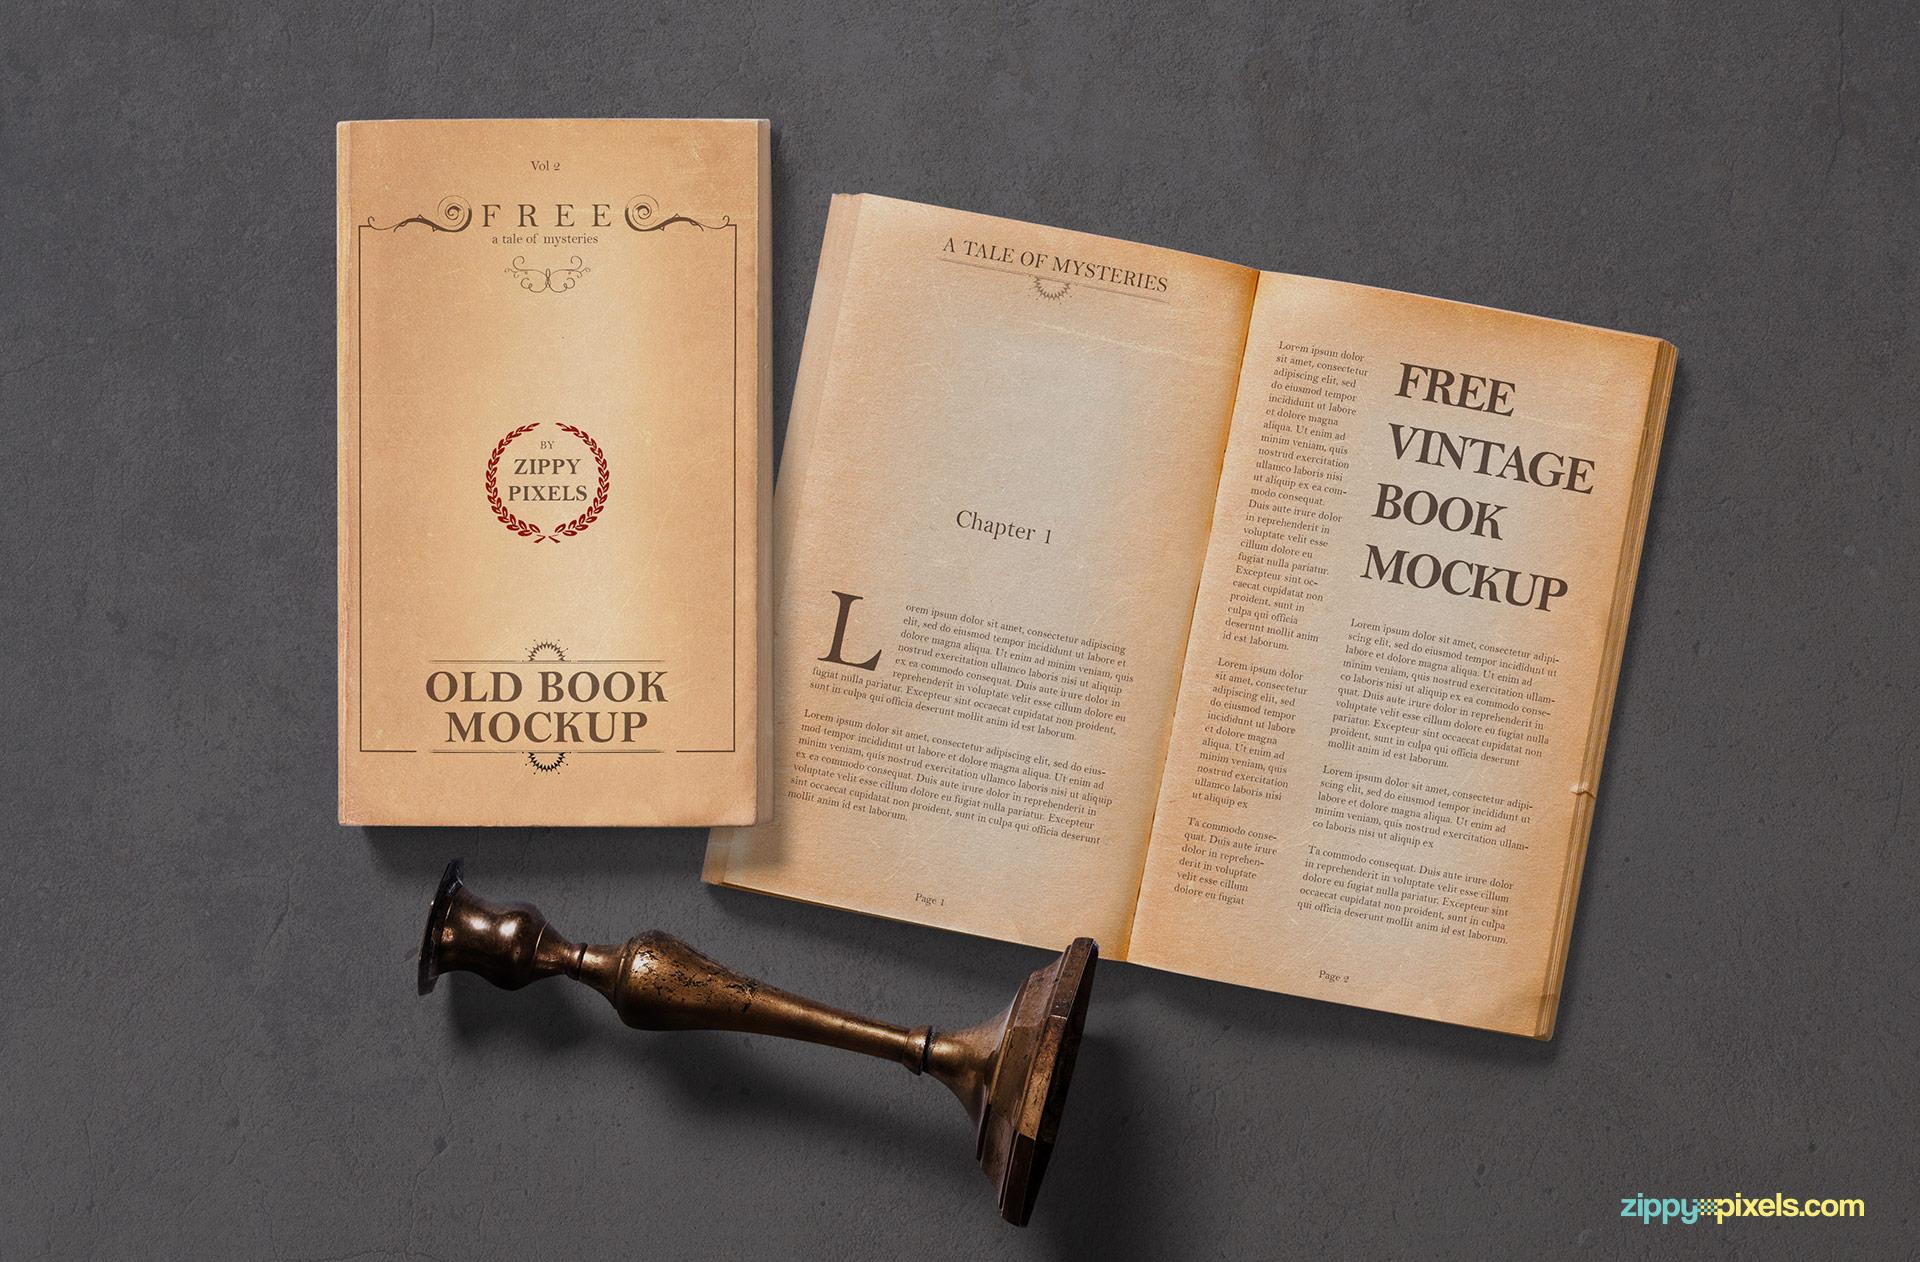 Free vintage book mockup.